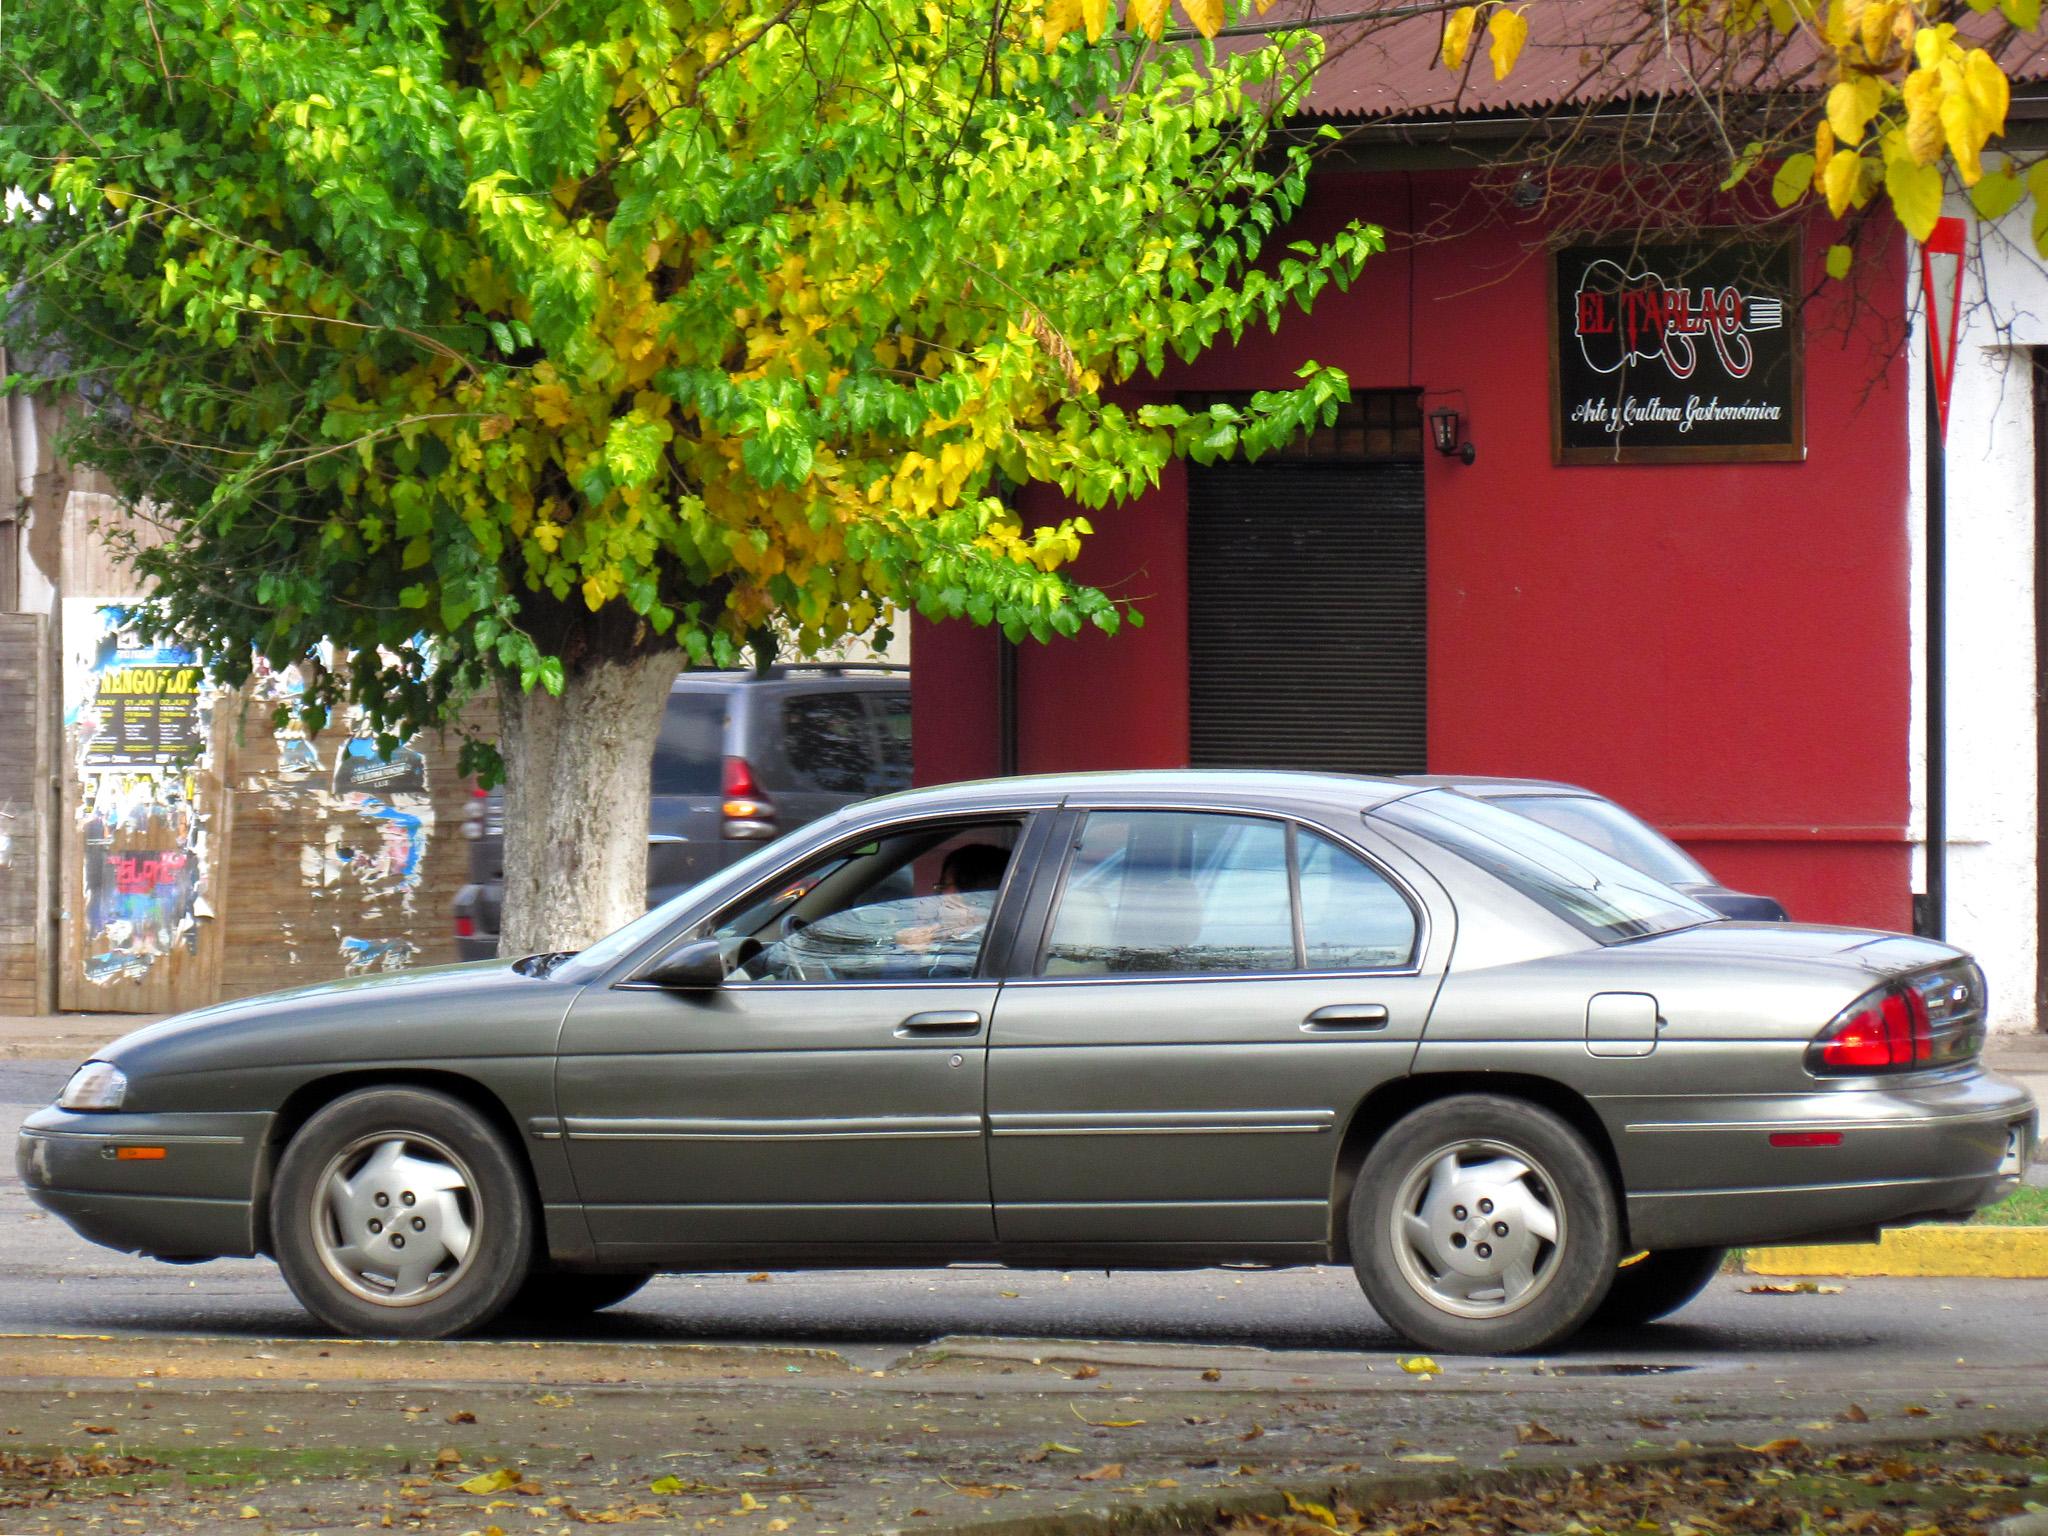 Old Chevy Cars >> File:Chevrolet Lumina LS 1996 (8808373685).jpg - Wikimedia Commons